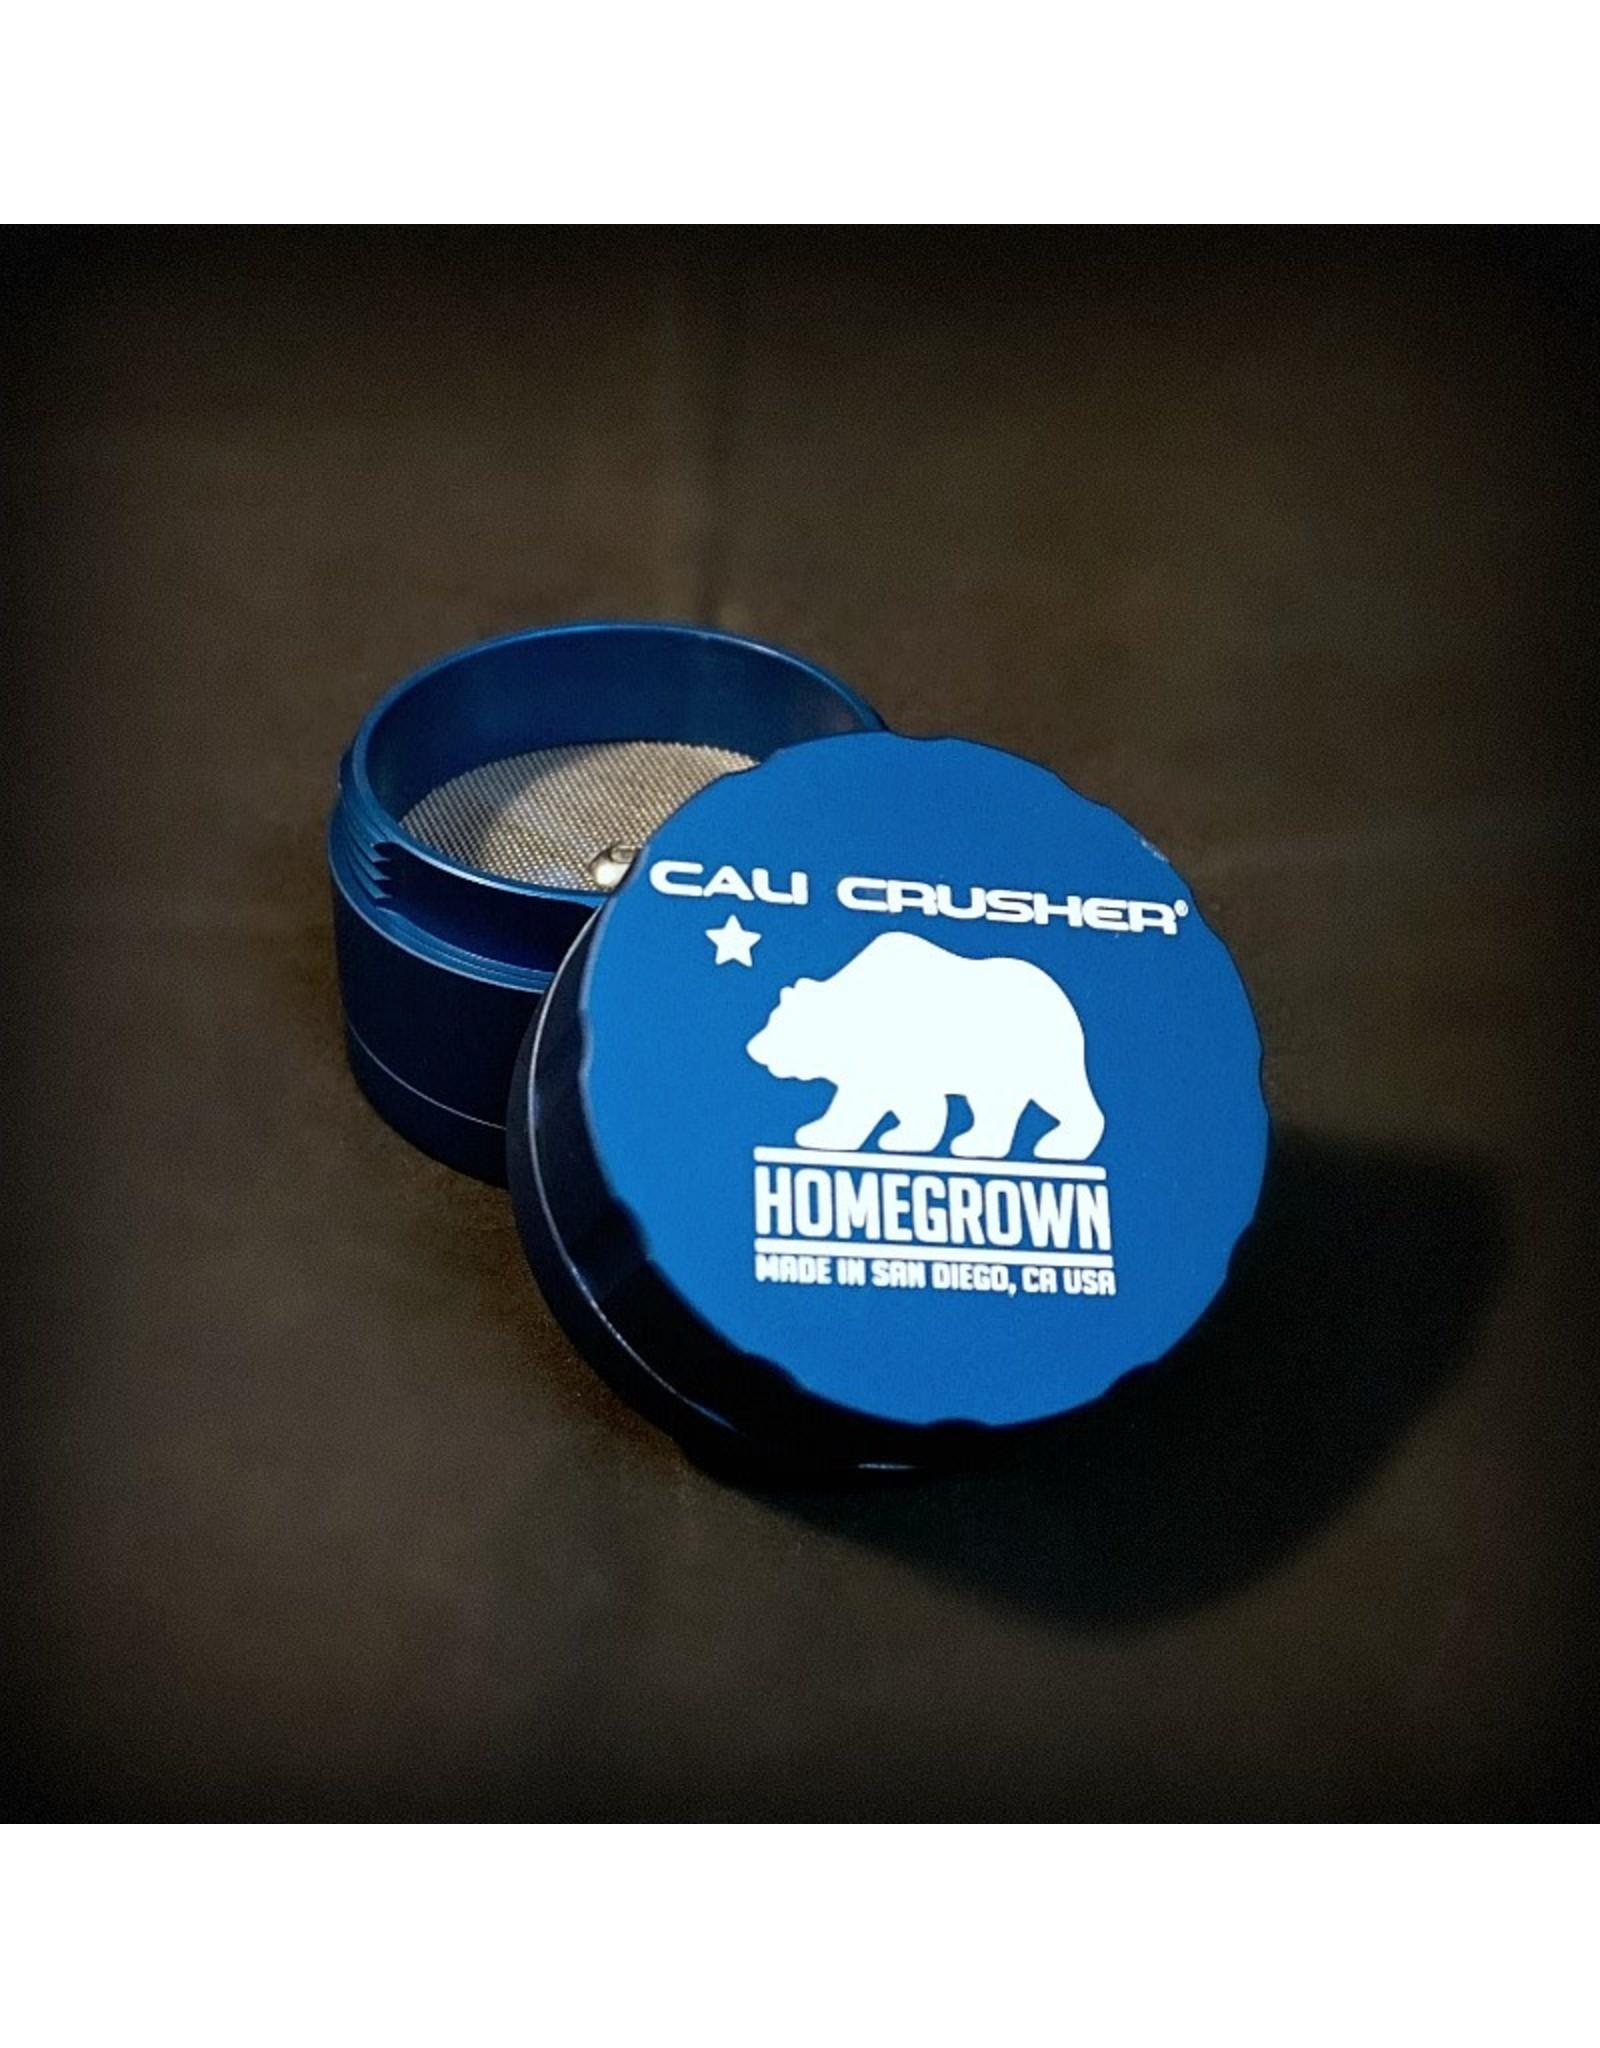 Cali Crusher Cali Crusher Homegrown 4pc Large - Blue